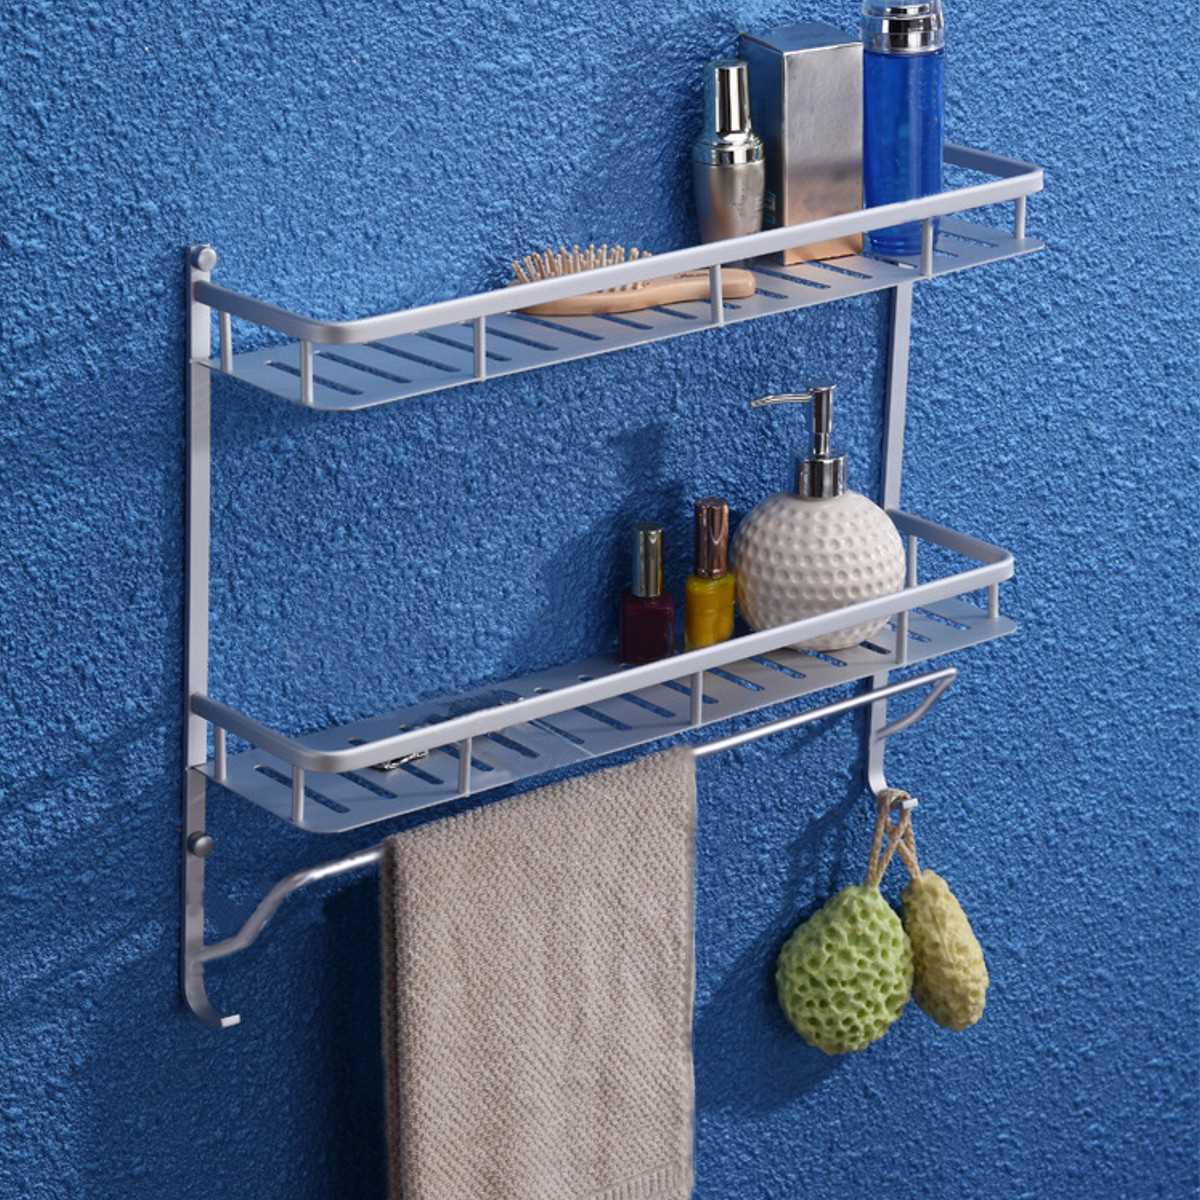 Kitchen Bathroom Storage Rack Shelf 1/2 Layer Space Saver Aluminium Hanger  Shower Sundries Shelves Organizer Holder In Storage Holders U0026 Racks From  Home ...